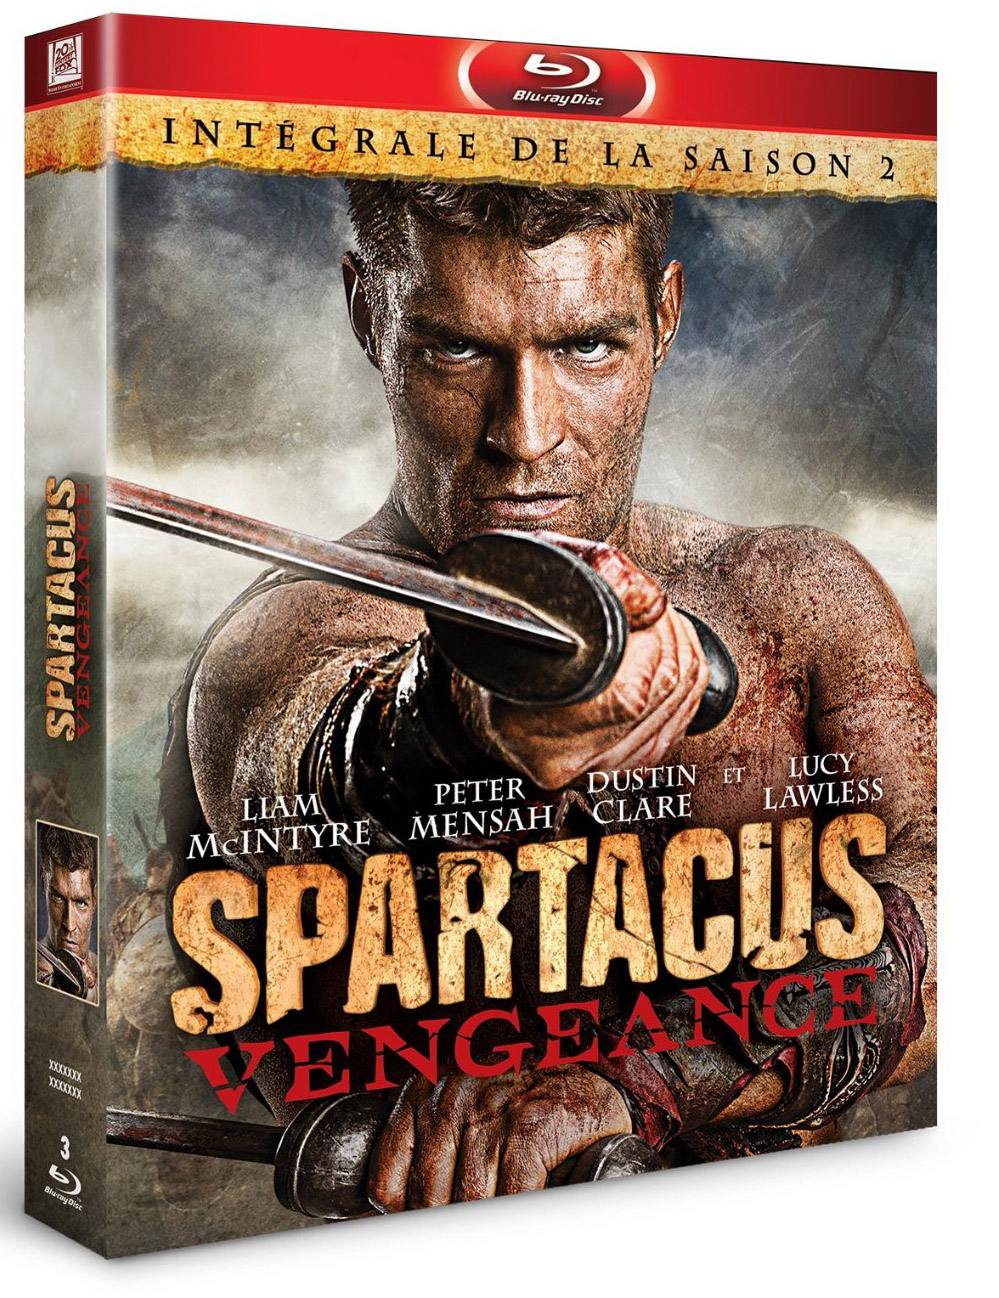 Filme Spartacus for spartacus vengeance - le blu-ray hardcore !